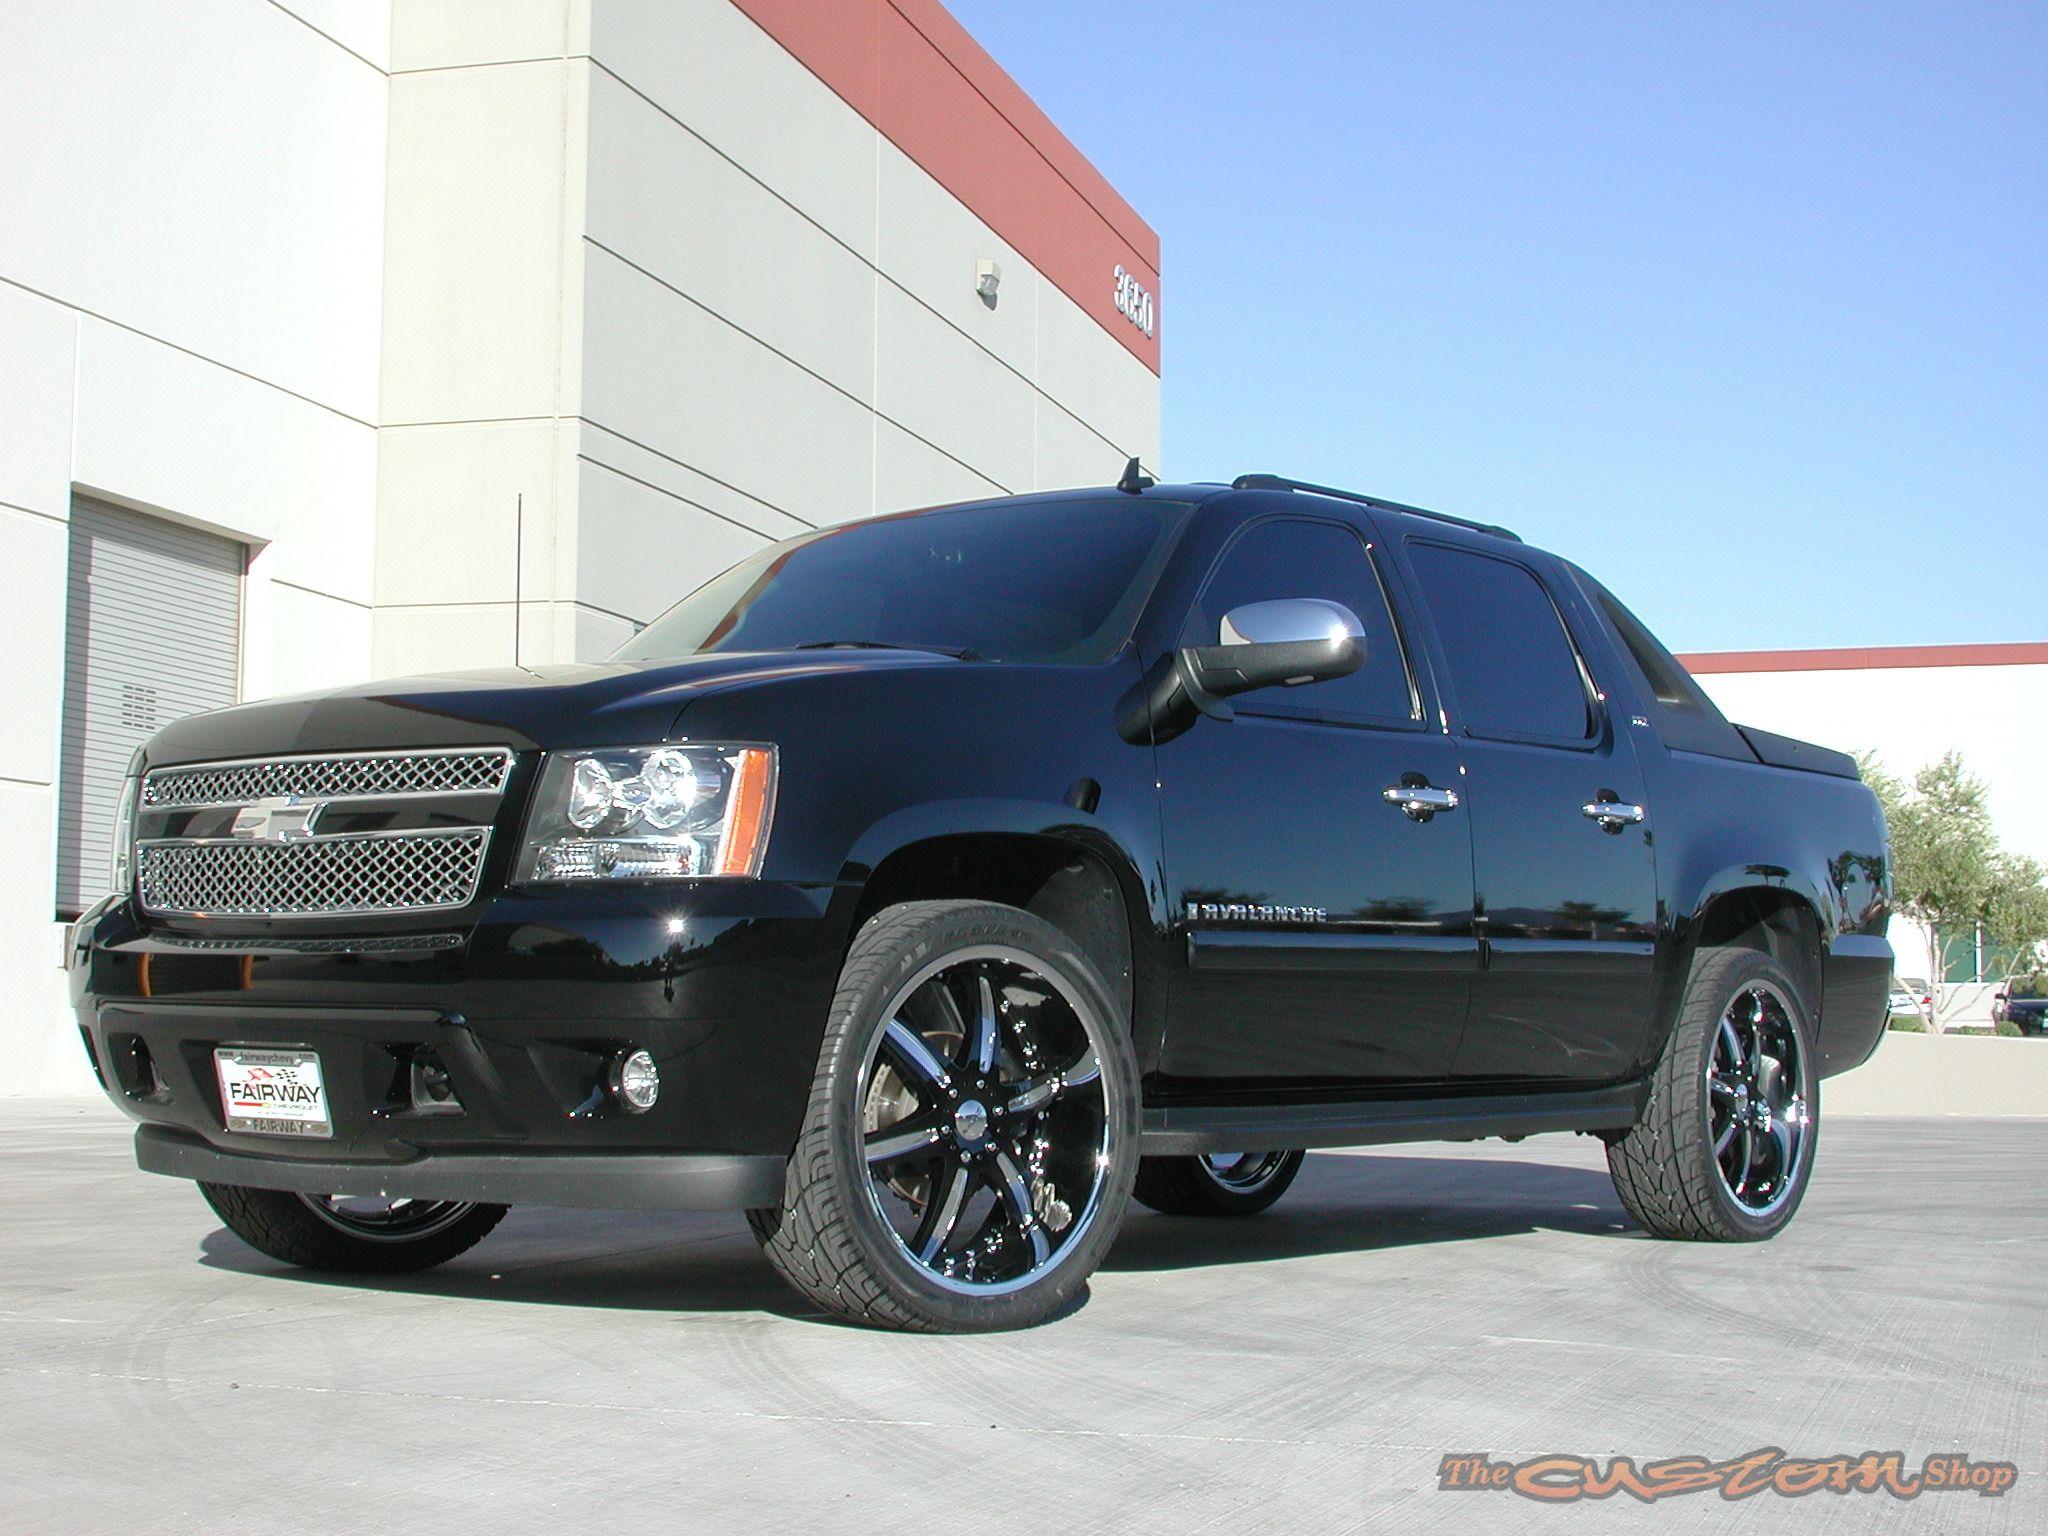 Black chevy silverado truck